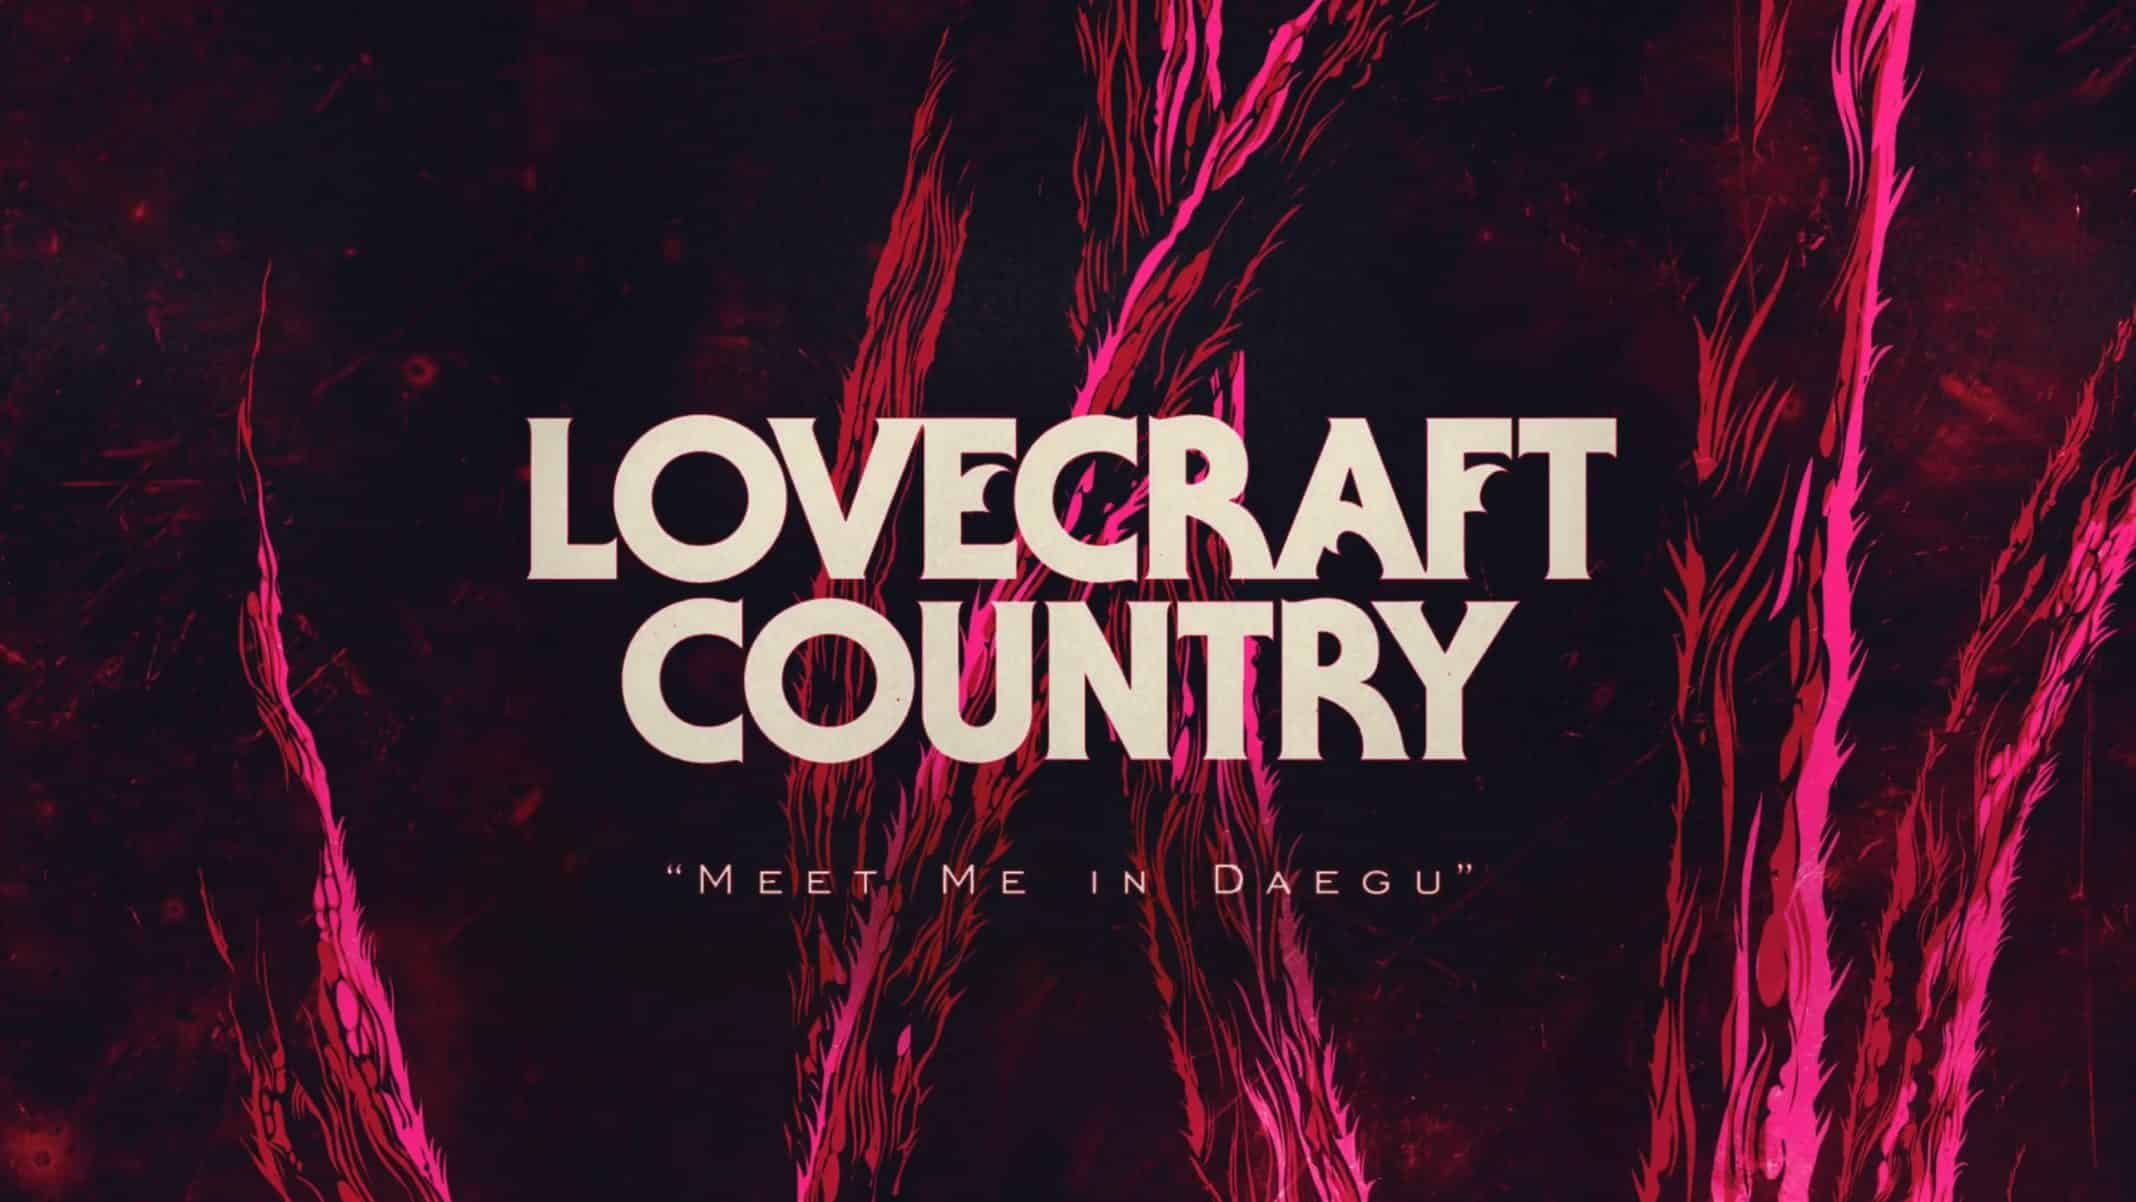 Title Card - Lovecraft Country Season 1 Episode 6 Meet Me In Daegu